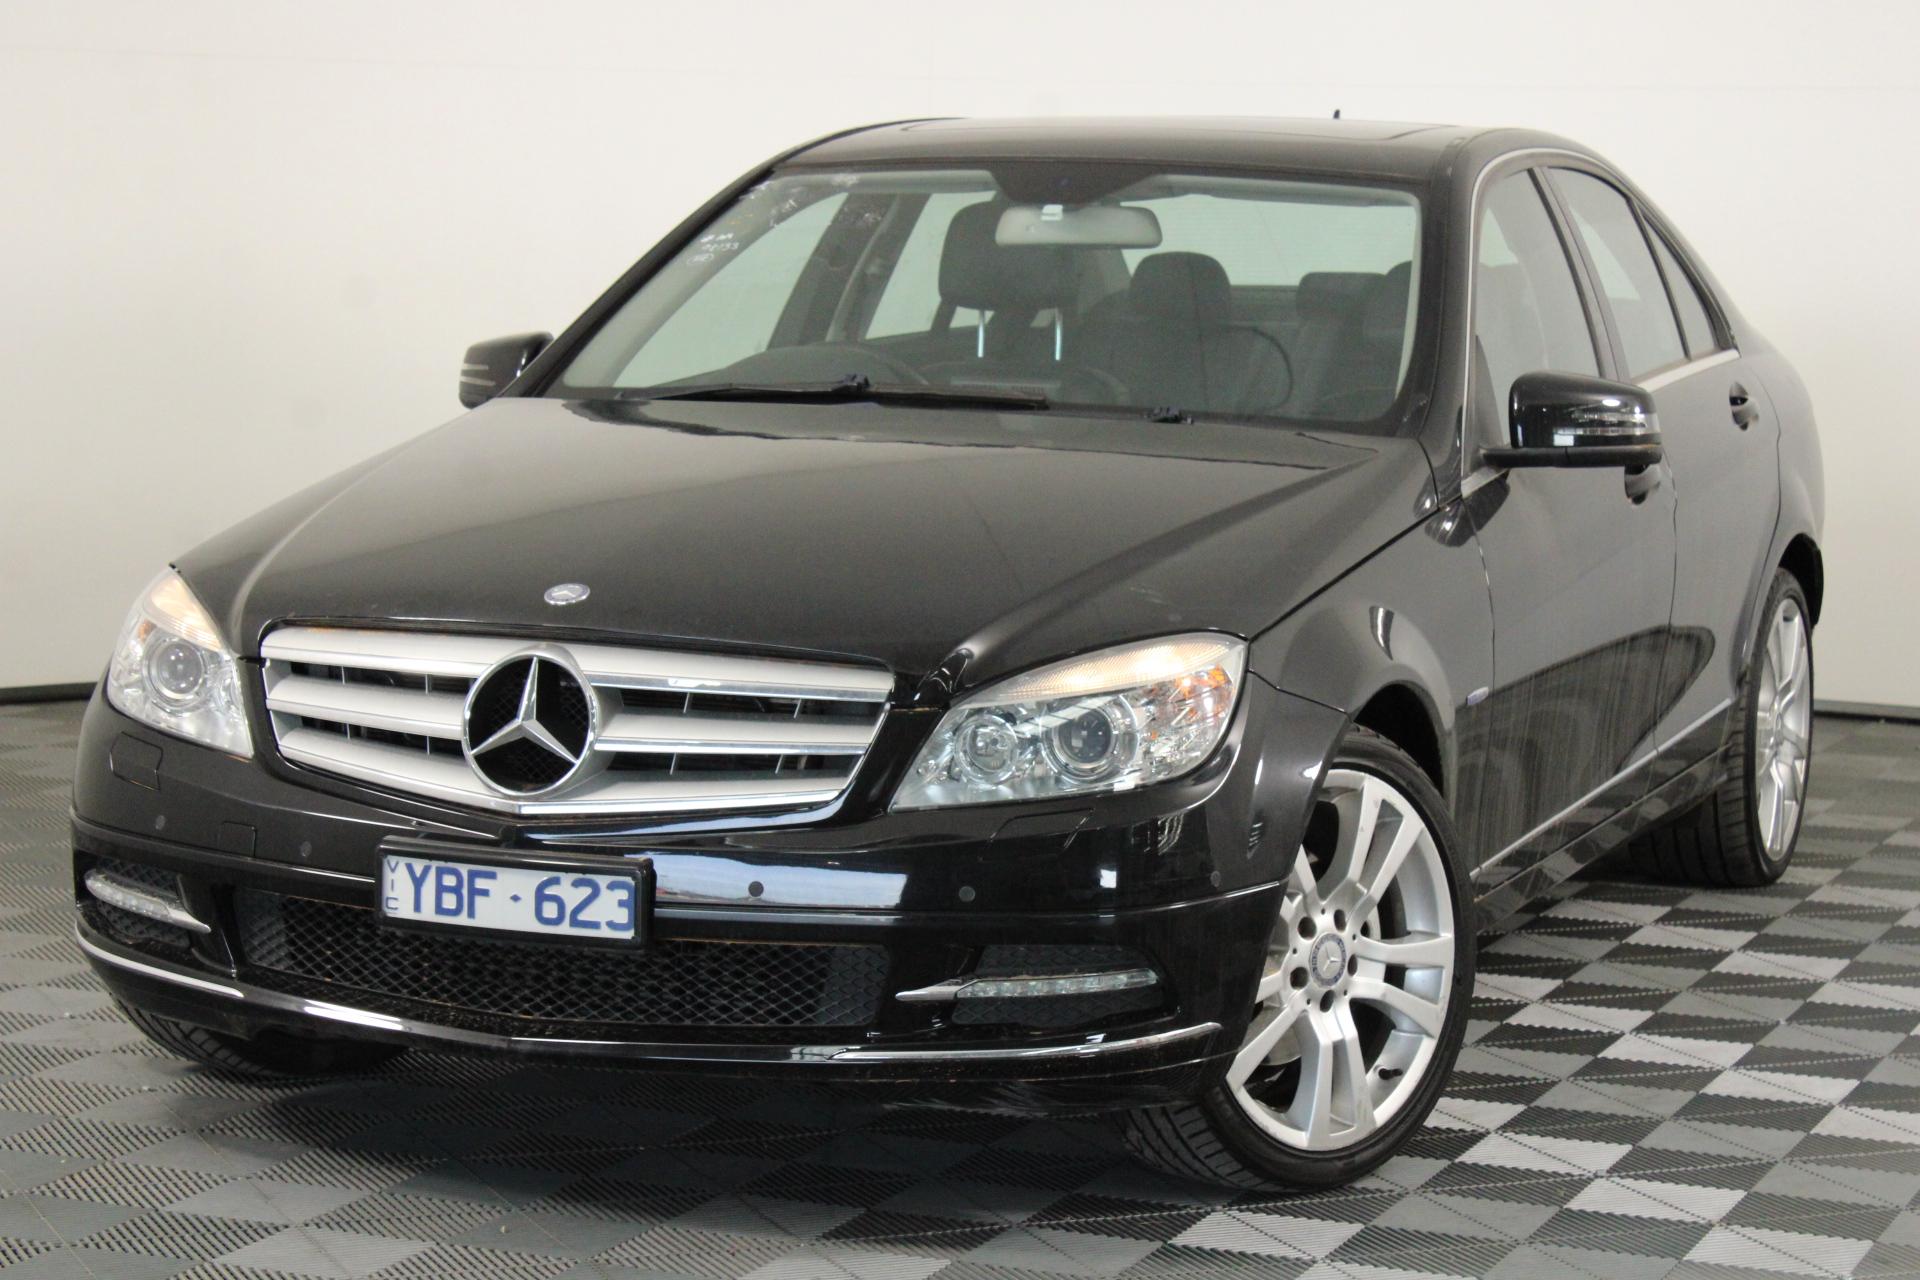 2010 Mercedes Benz C250 BE Avantgarde W204 Automatic Sedan